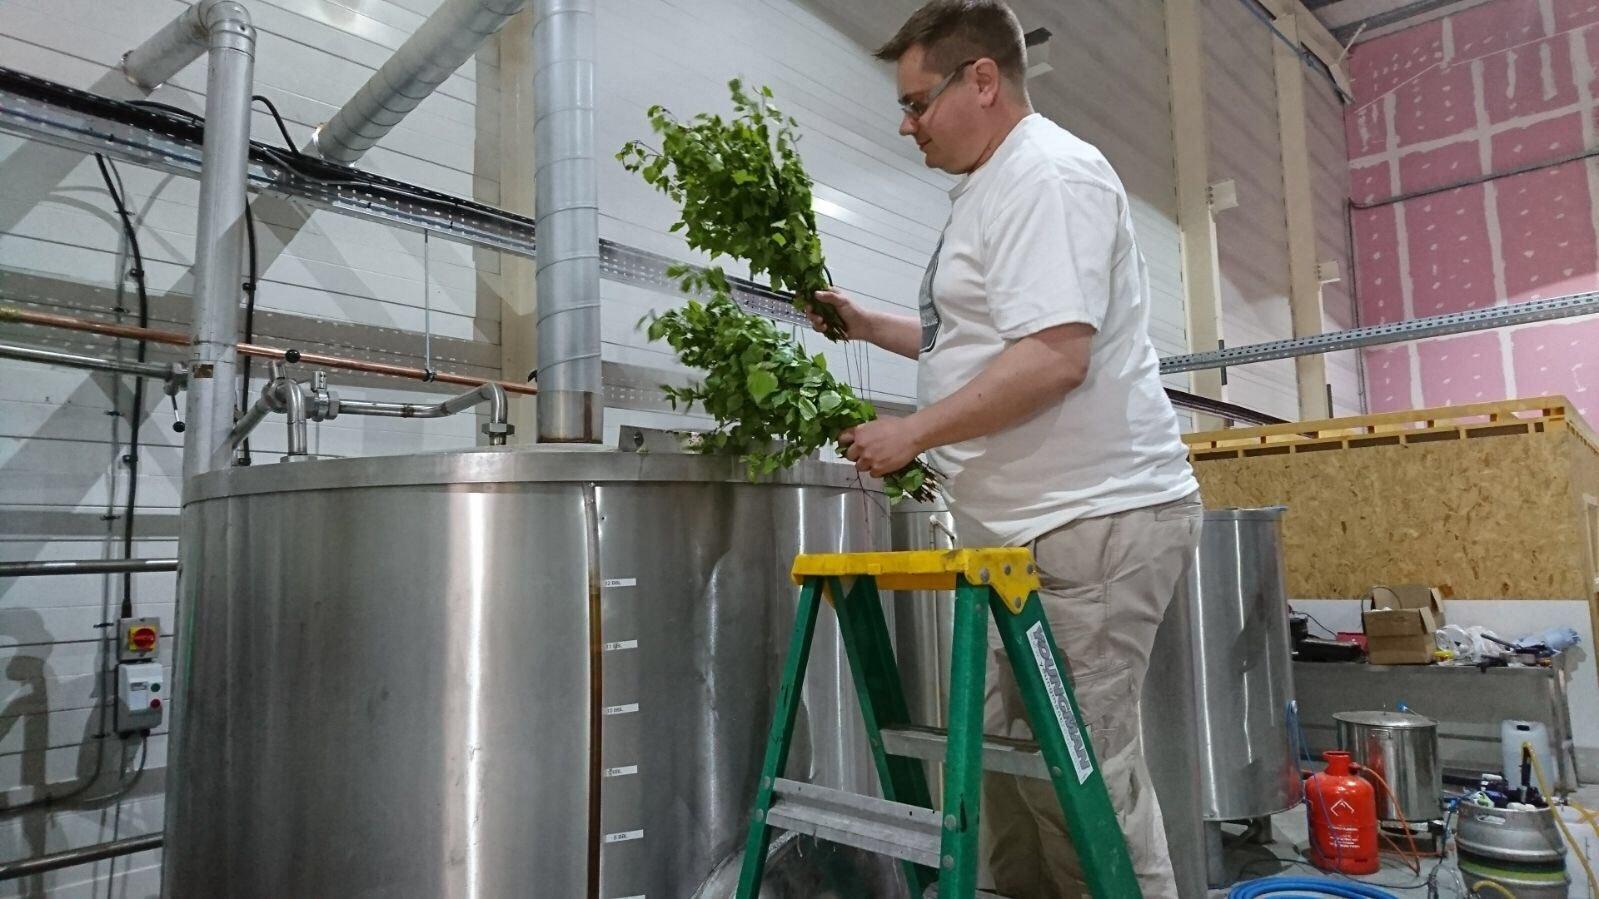 alechemy brewing maku collaboration nordic beer birch leaves craft beer mash tun